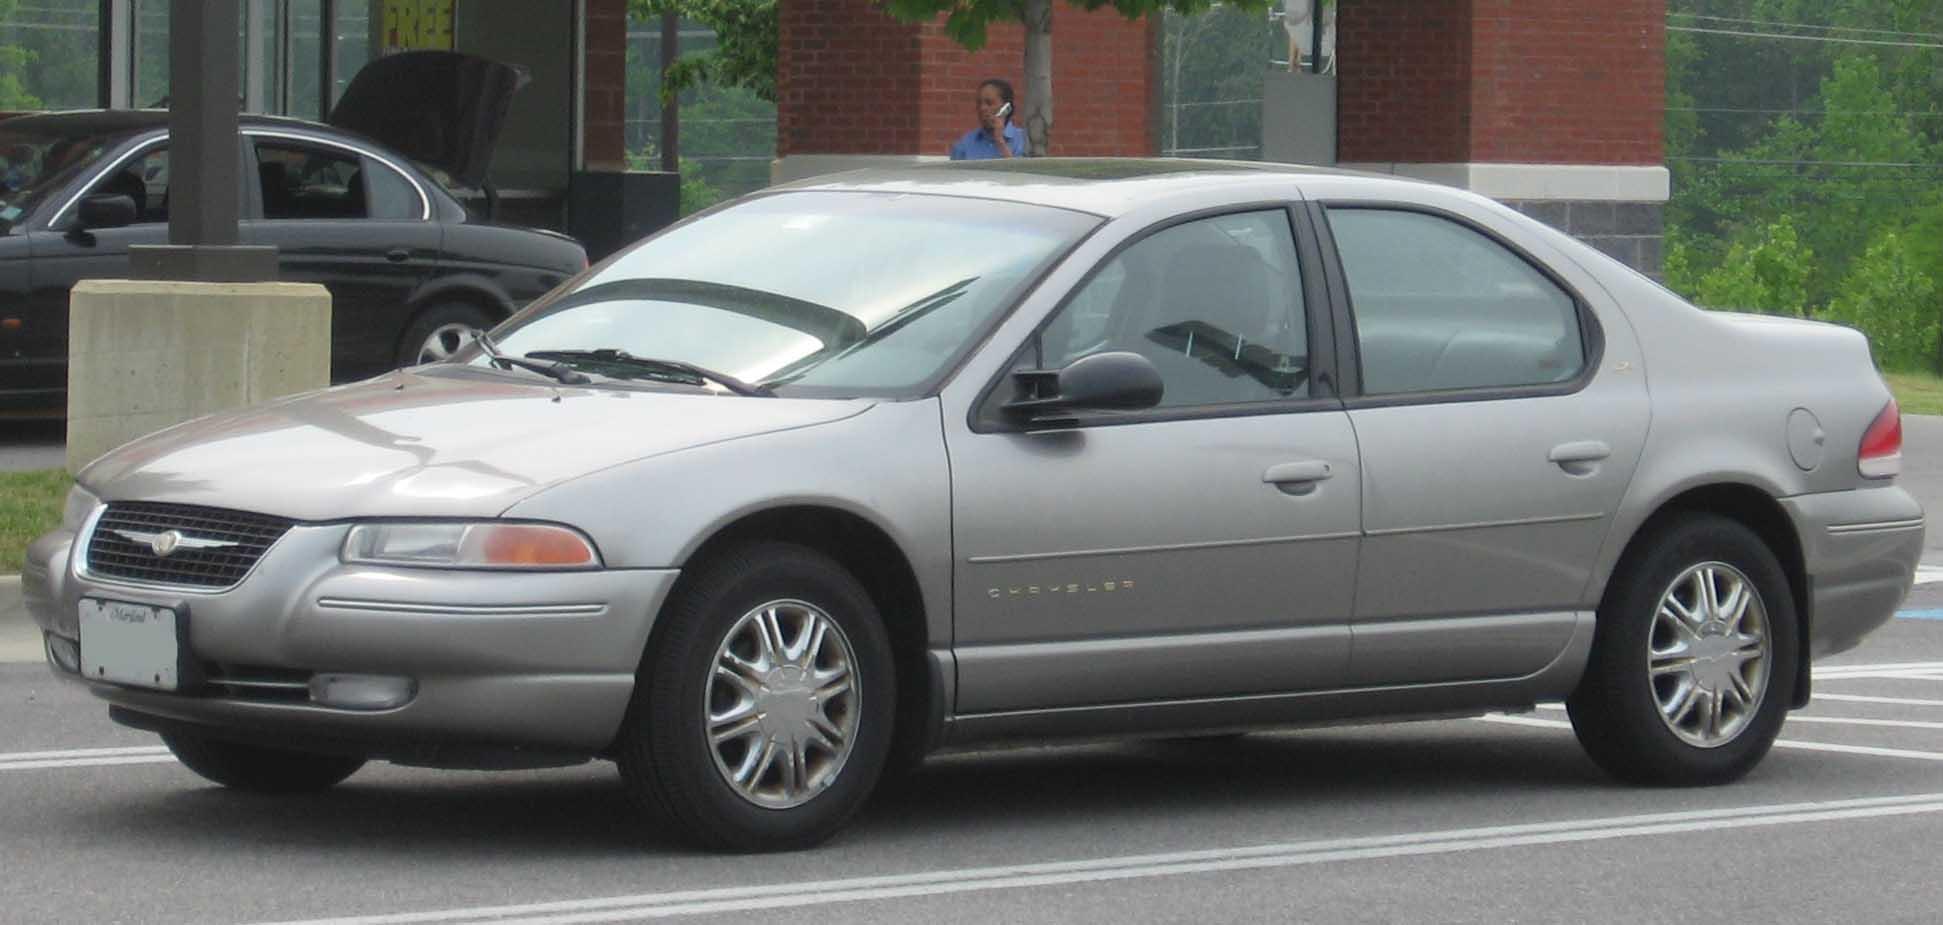 Chrysler front wheel drive turbo cars